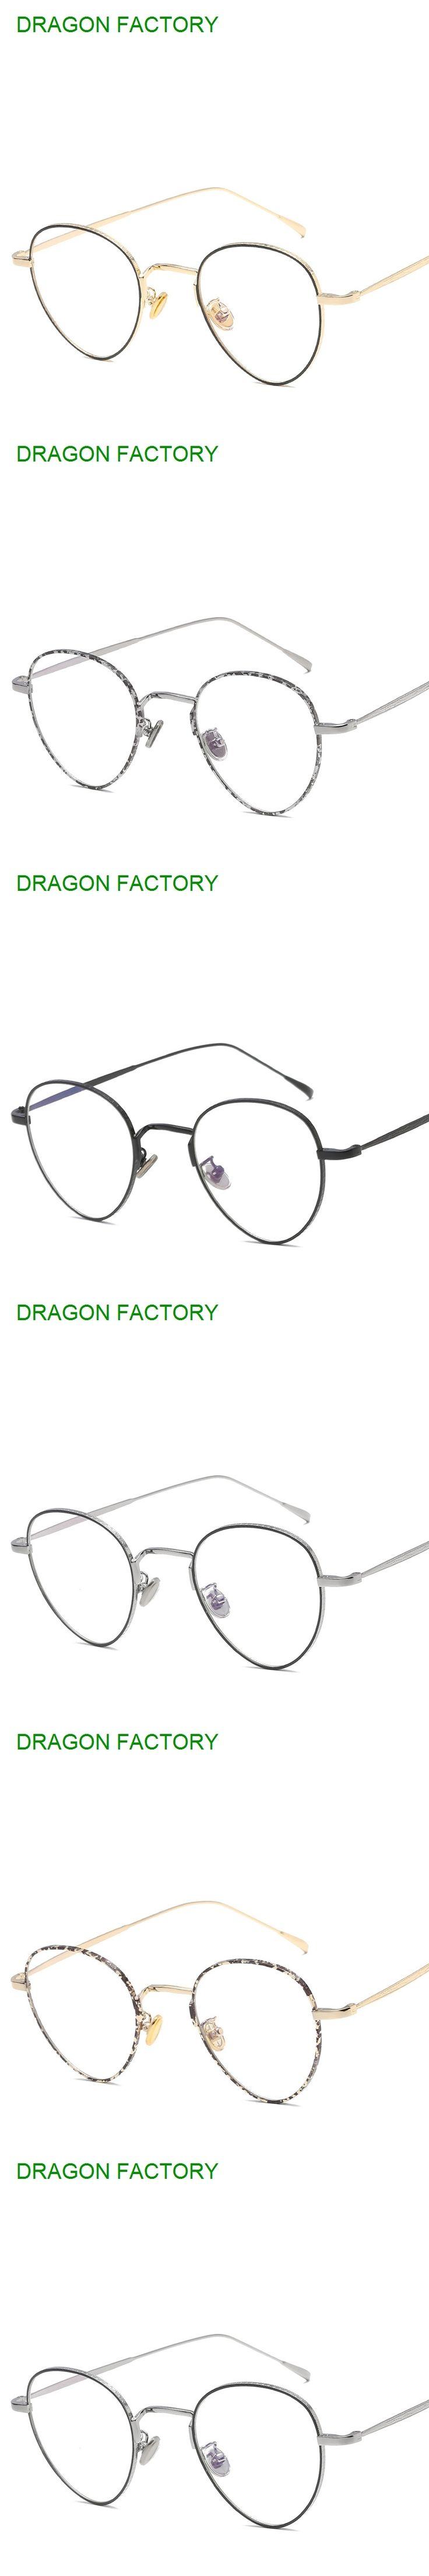 new metal flat mirror  for men and women  general female male glasses retro round designer glasses frame DZ0220